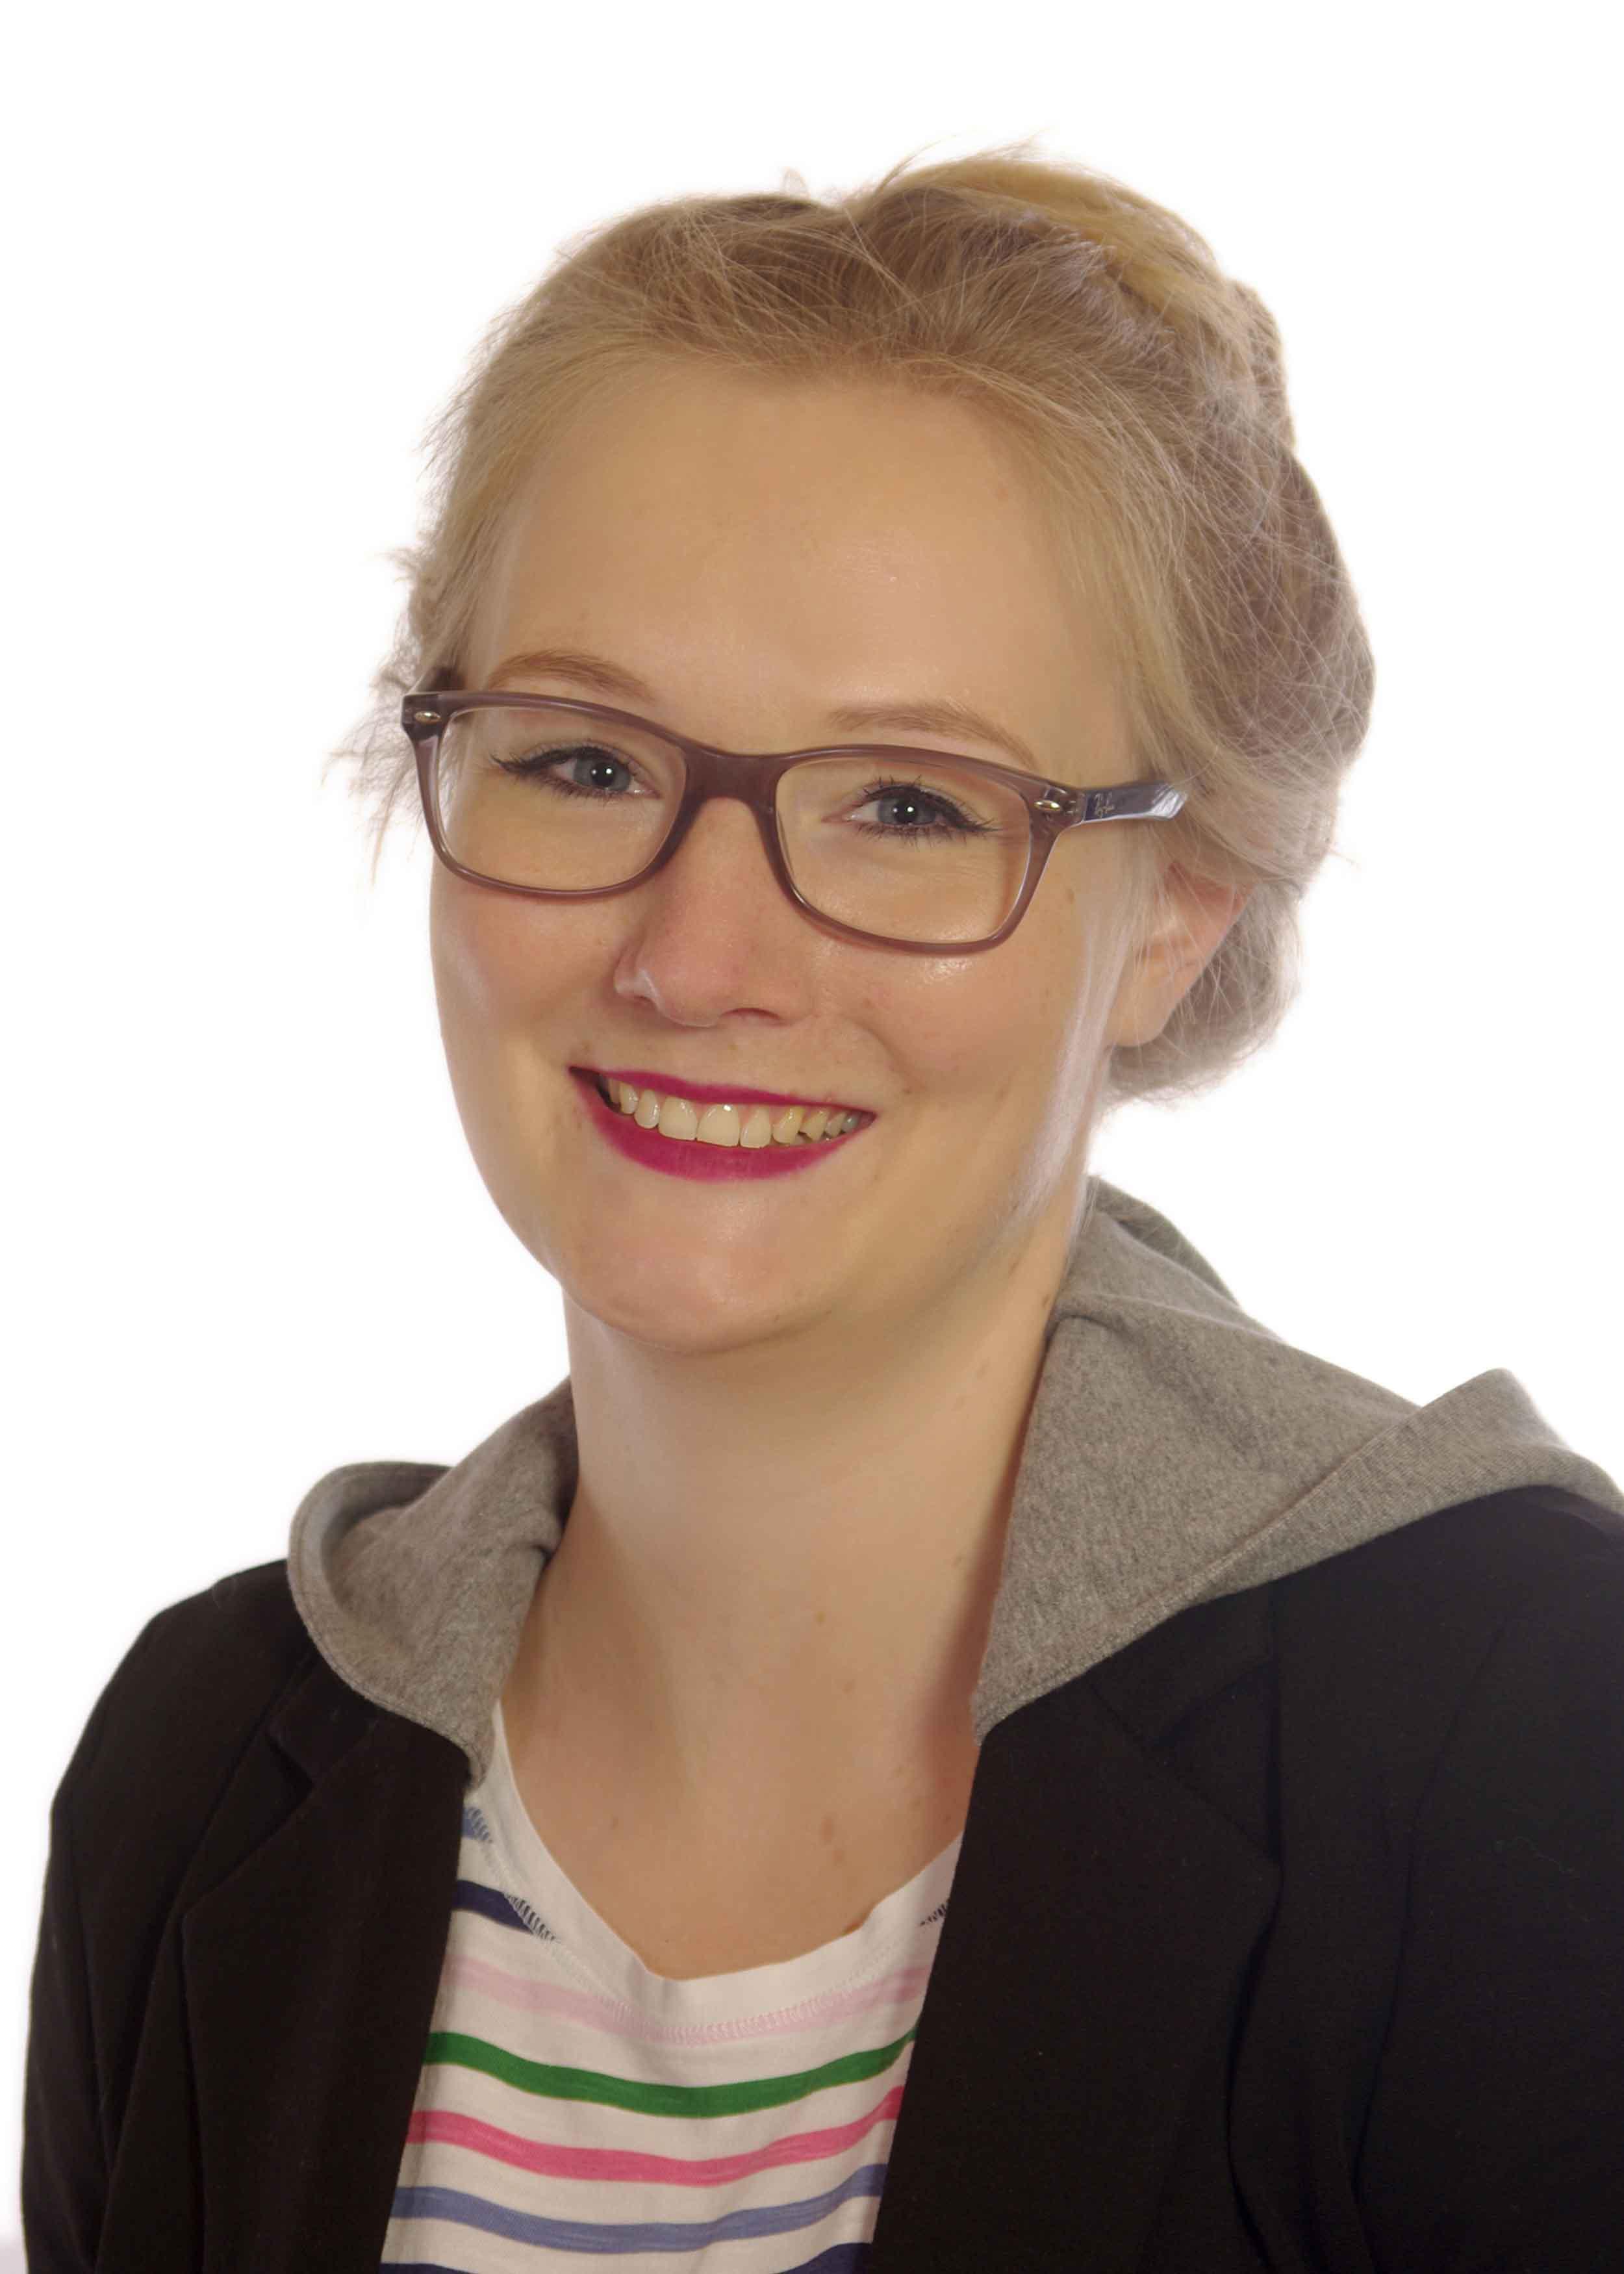 Tanja Iserlohe